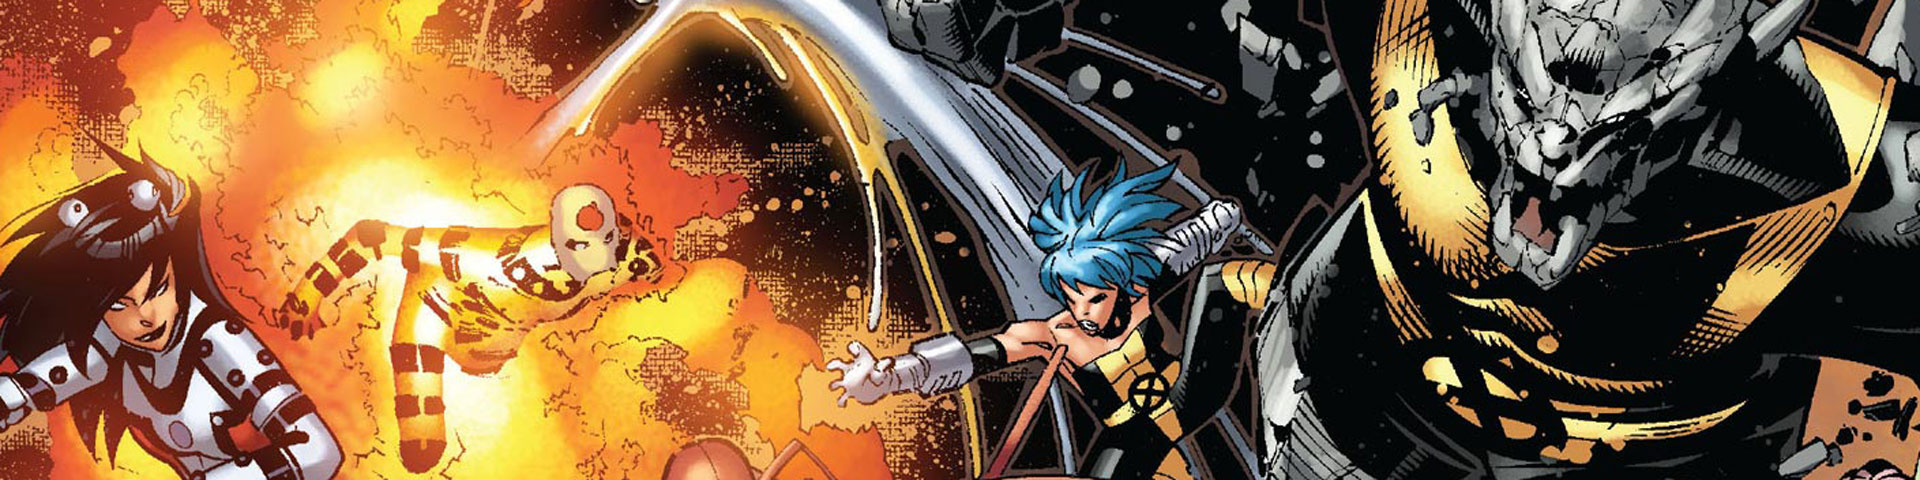 Mutant combatants throw themselves into combat.